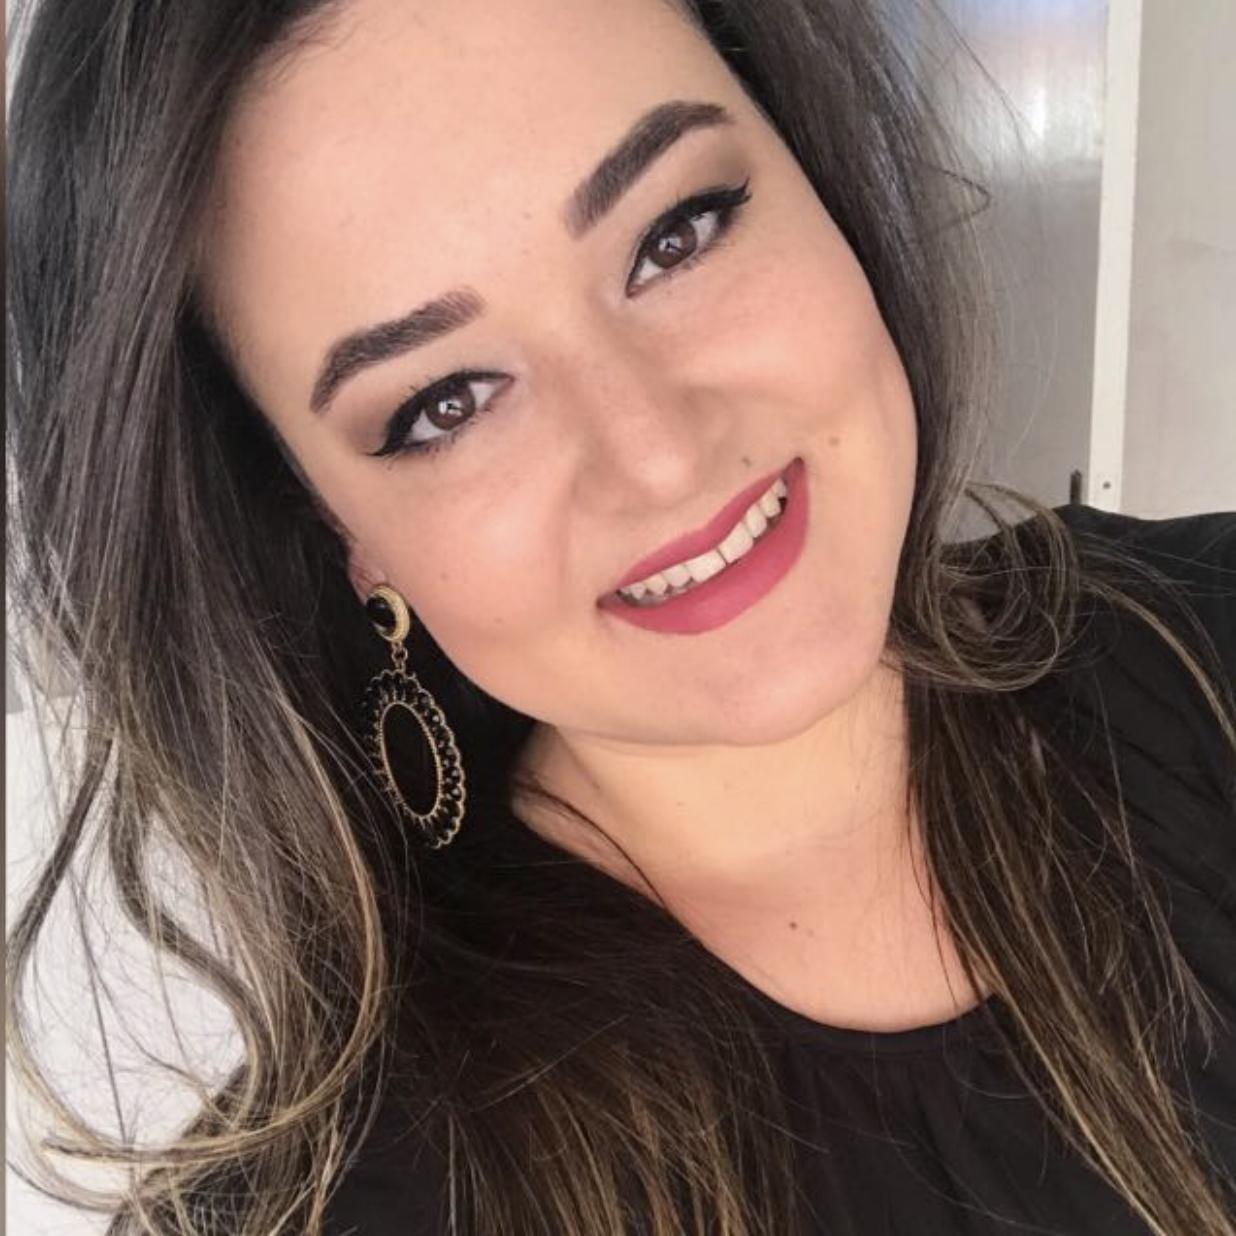 Anna Letícia Costa